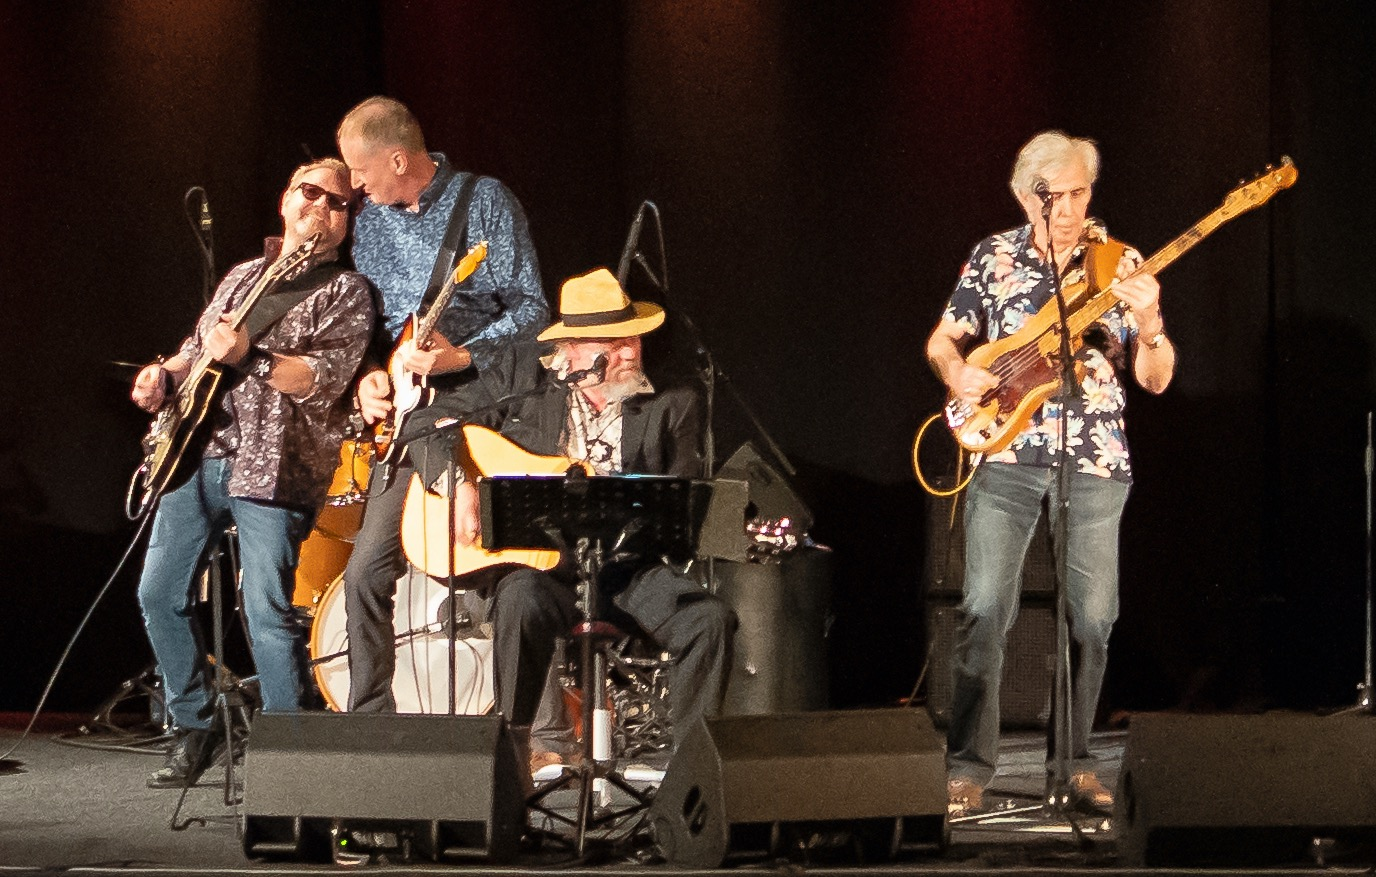 Charly Schreckschuss Band im Culturgut - 18.01.2020 - Foto Marcus Dewanger